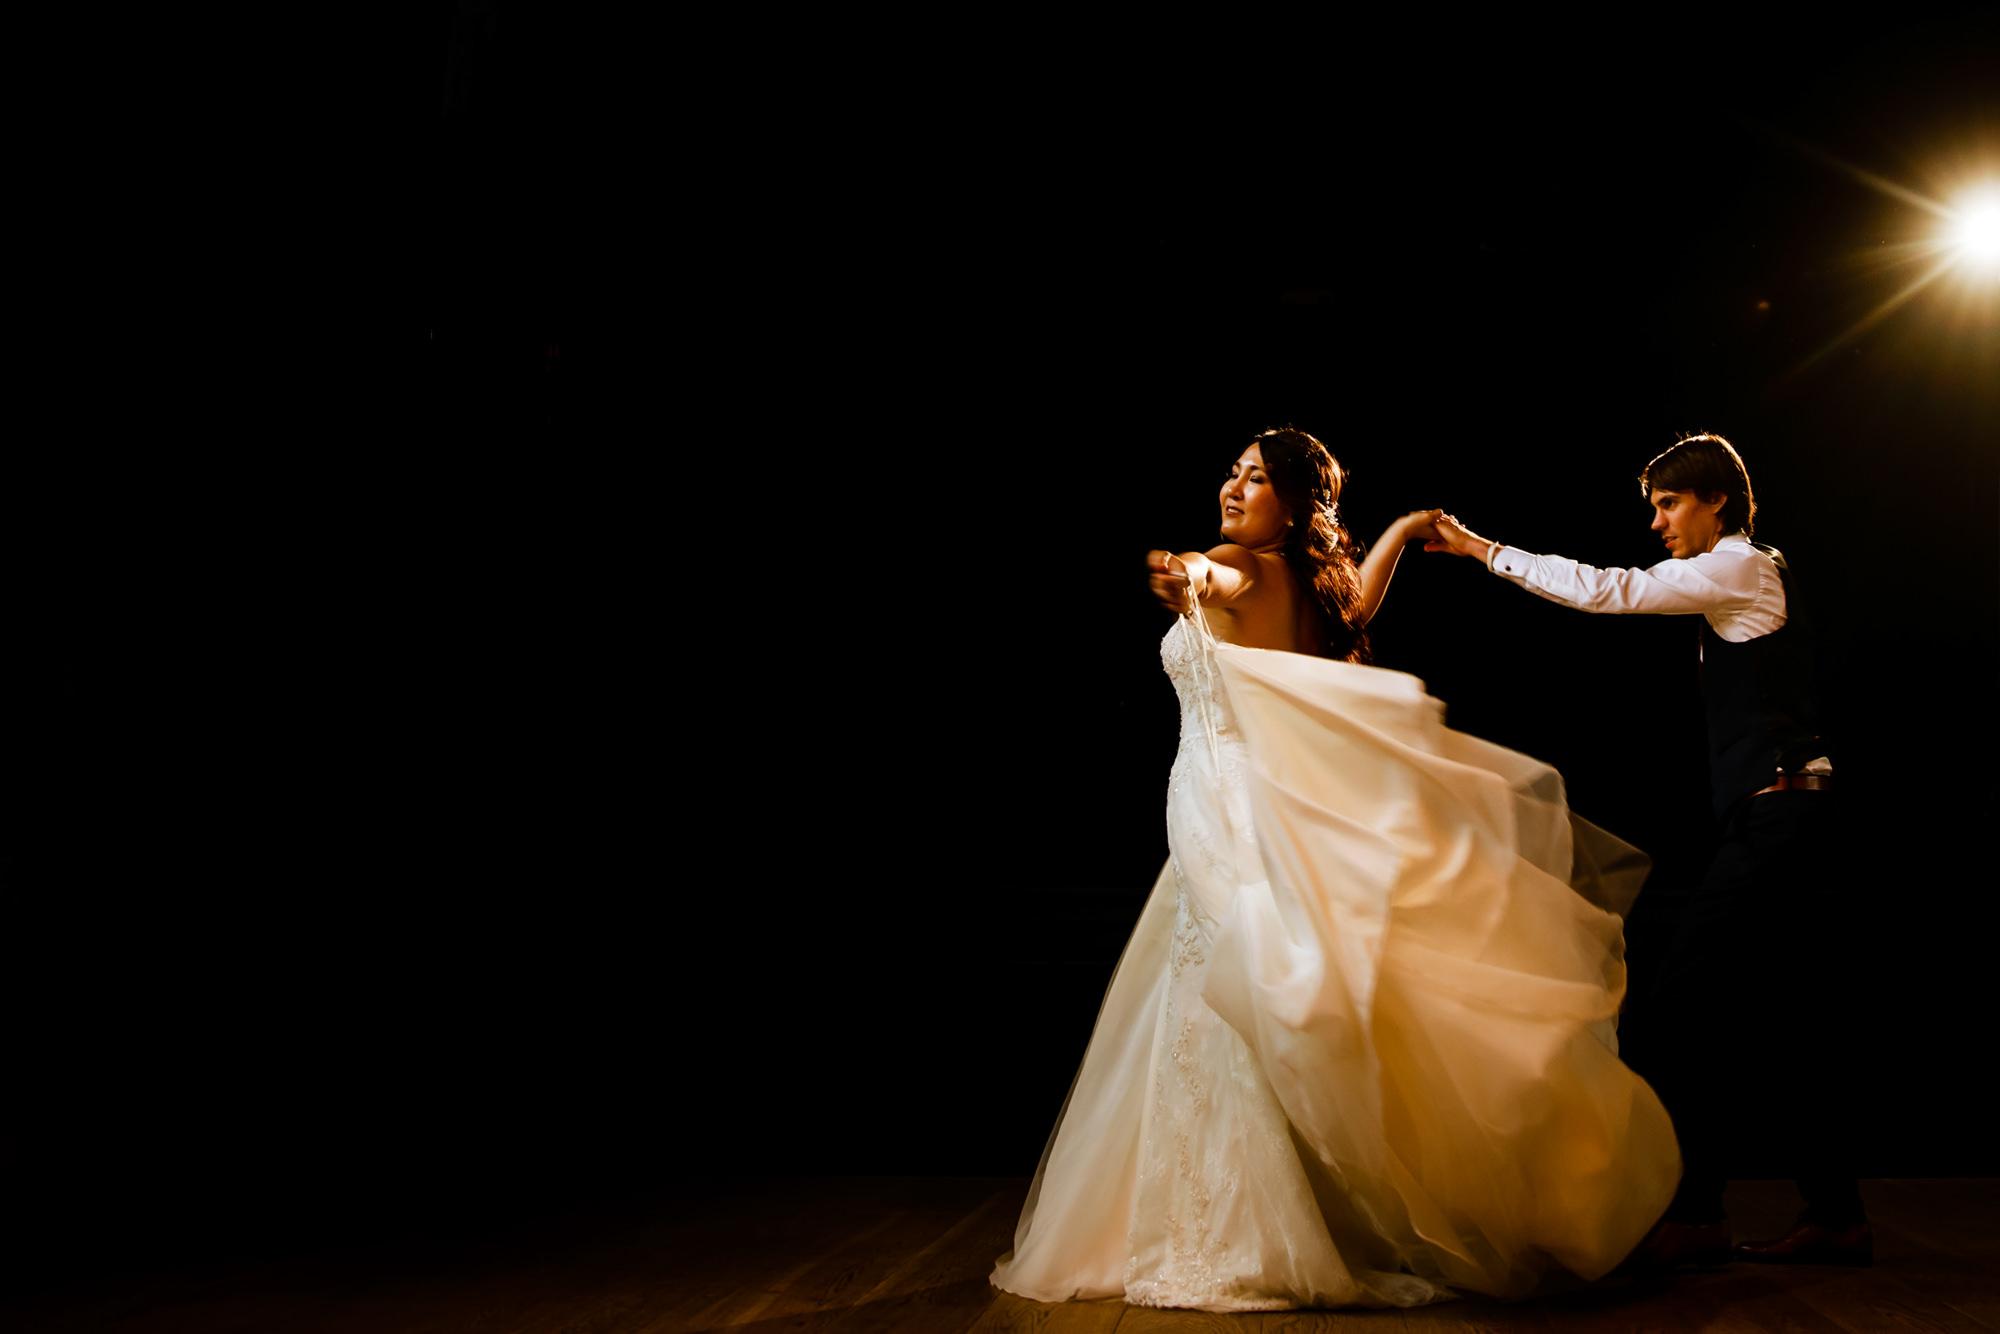 Bride leads groom to dance floor - photo by Philippe Swiggers